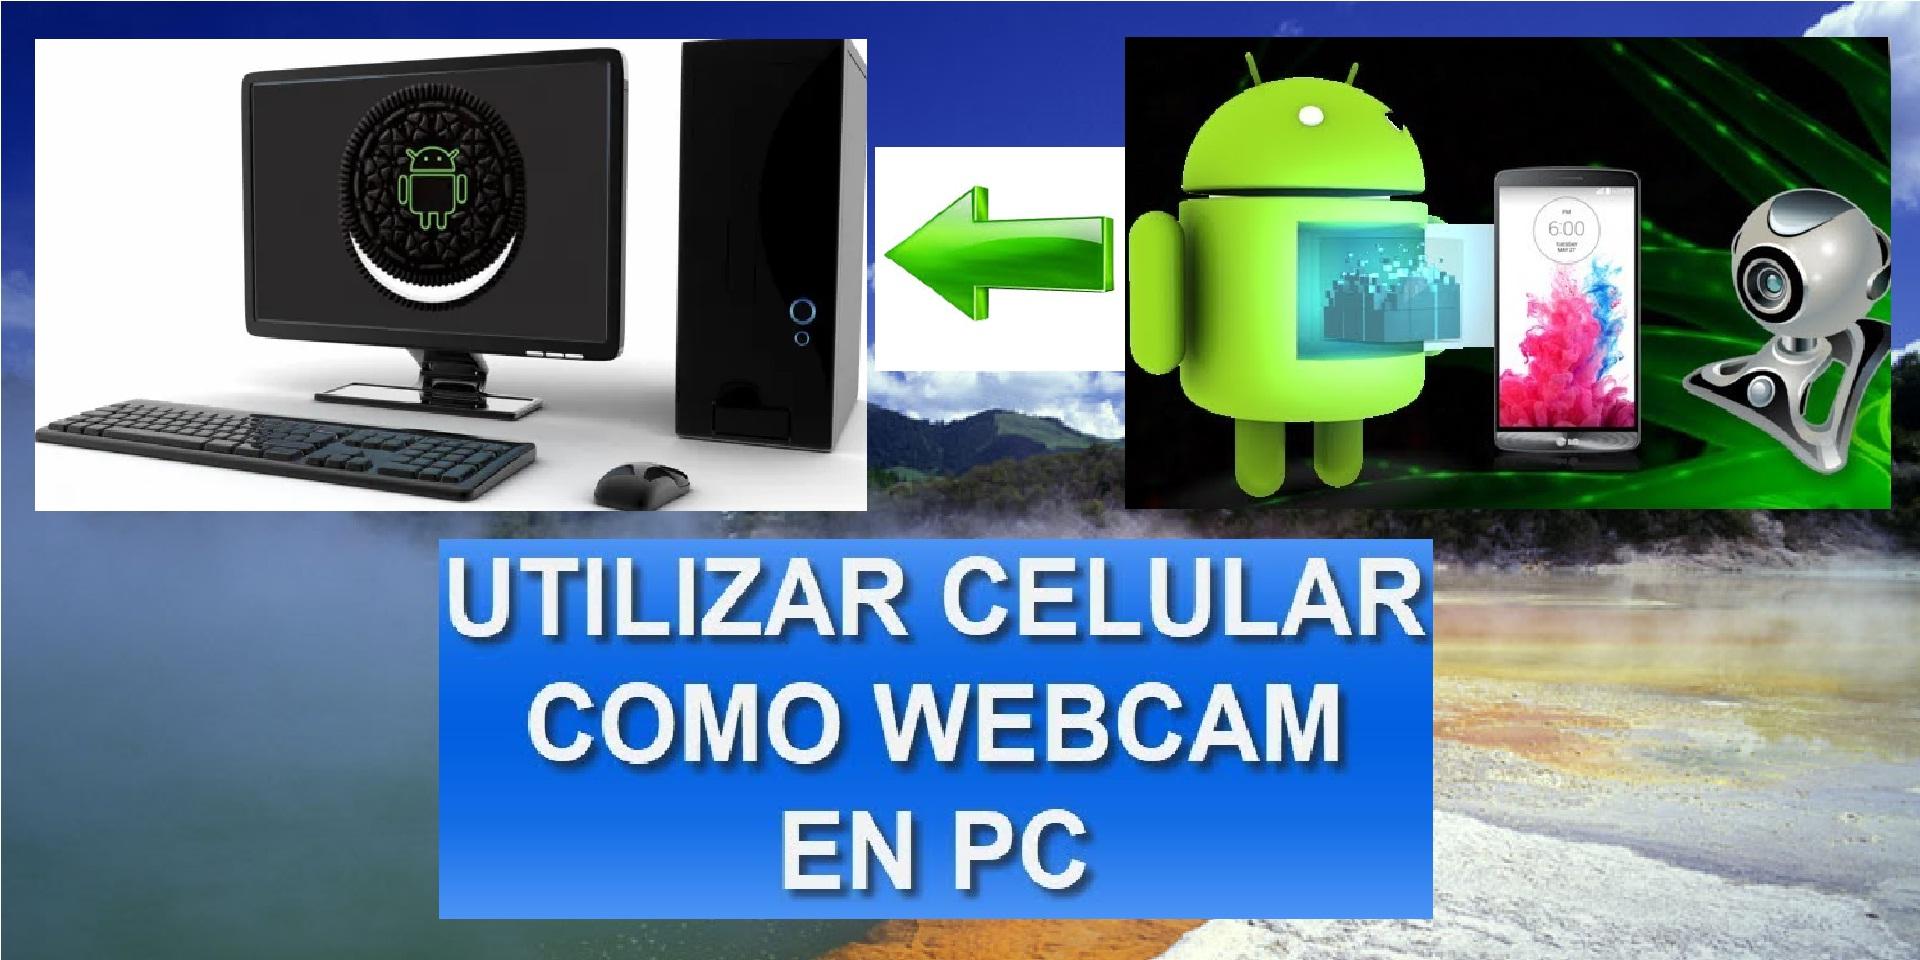 3 Formas Prácticas para Usar tú Móvil Como Webcam en tu PC